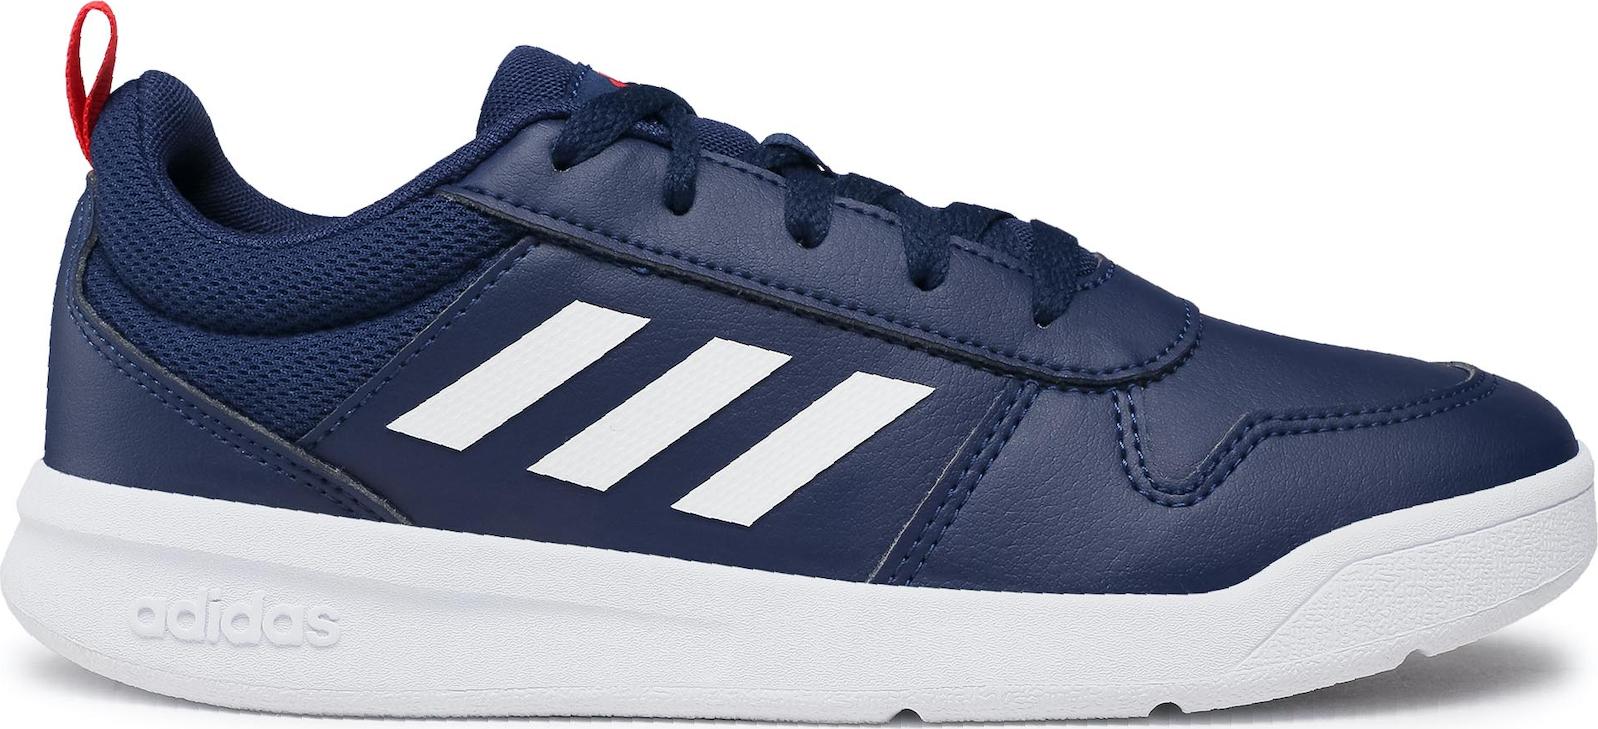 Adidas αθλητικό μπλέ S24035